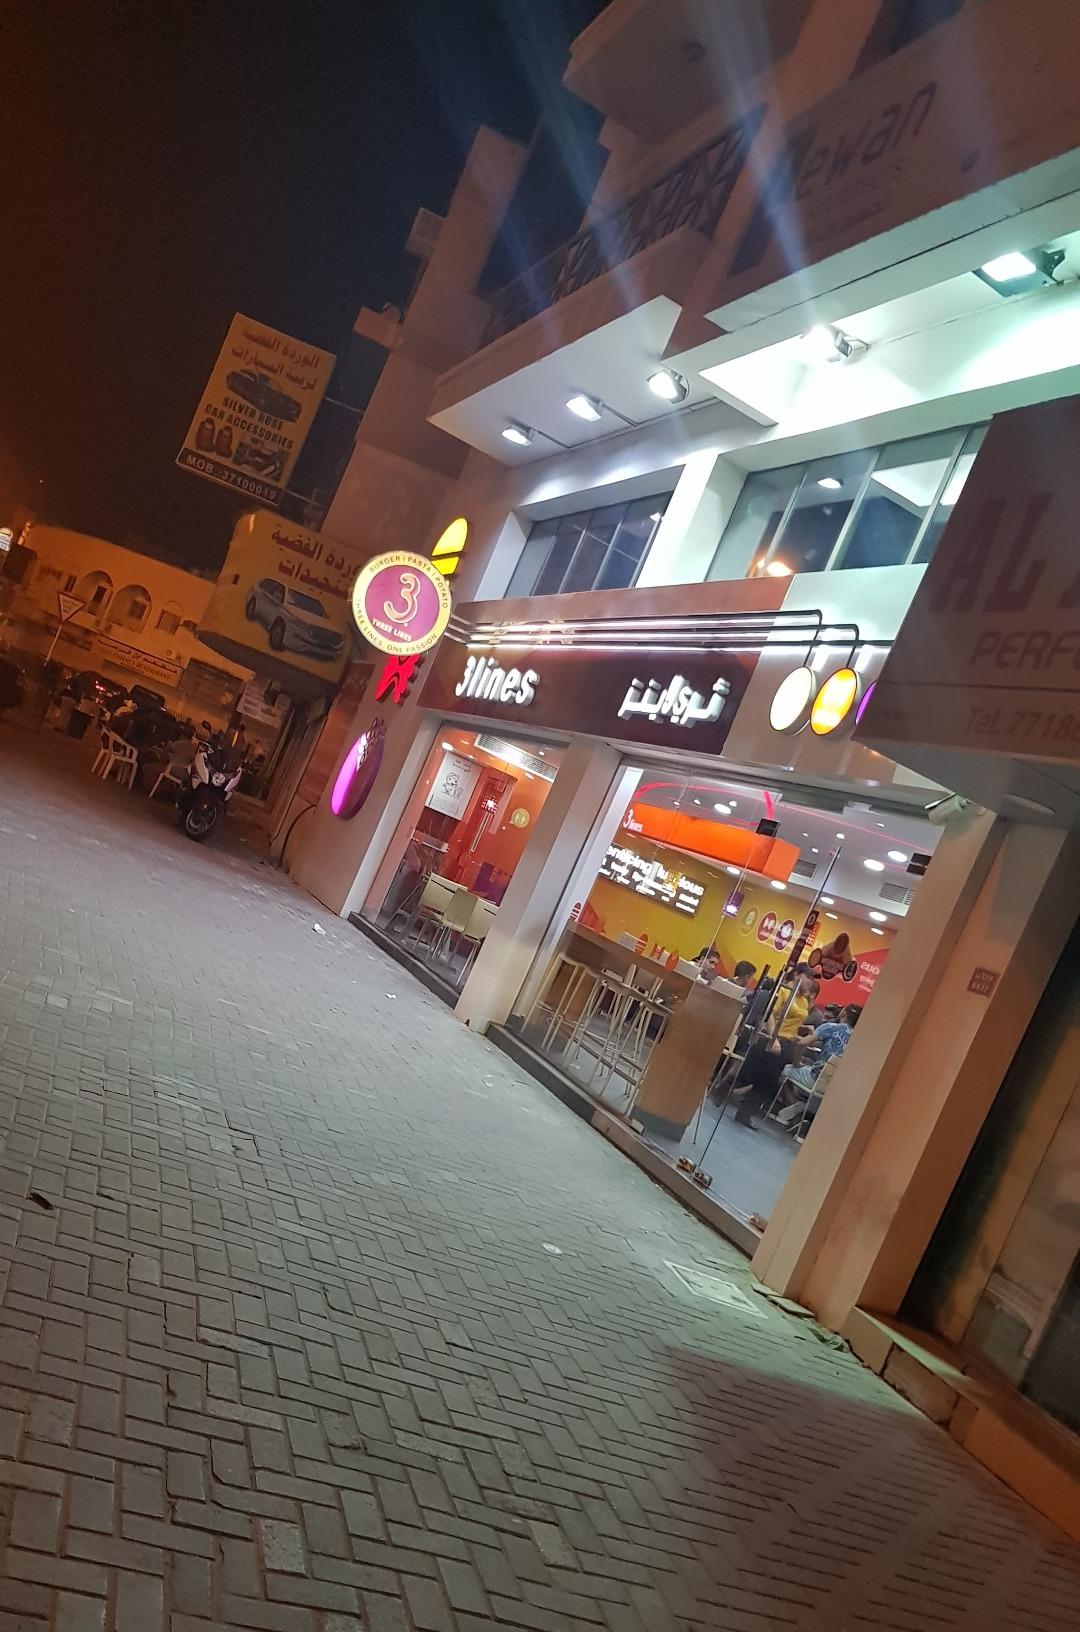 3 Lines Restaurant - Bahrain